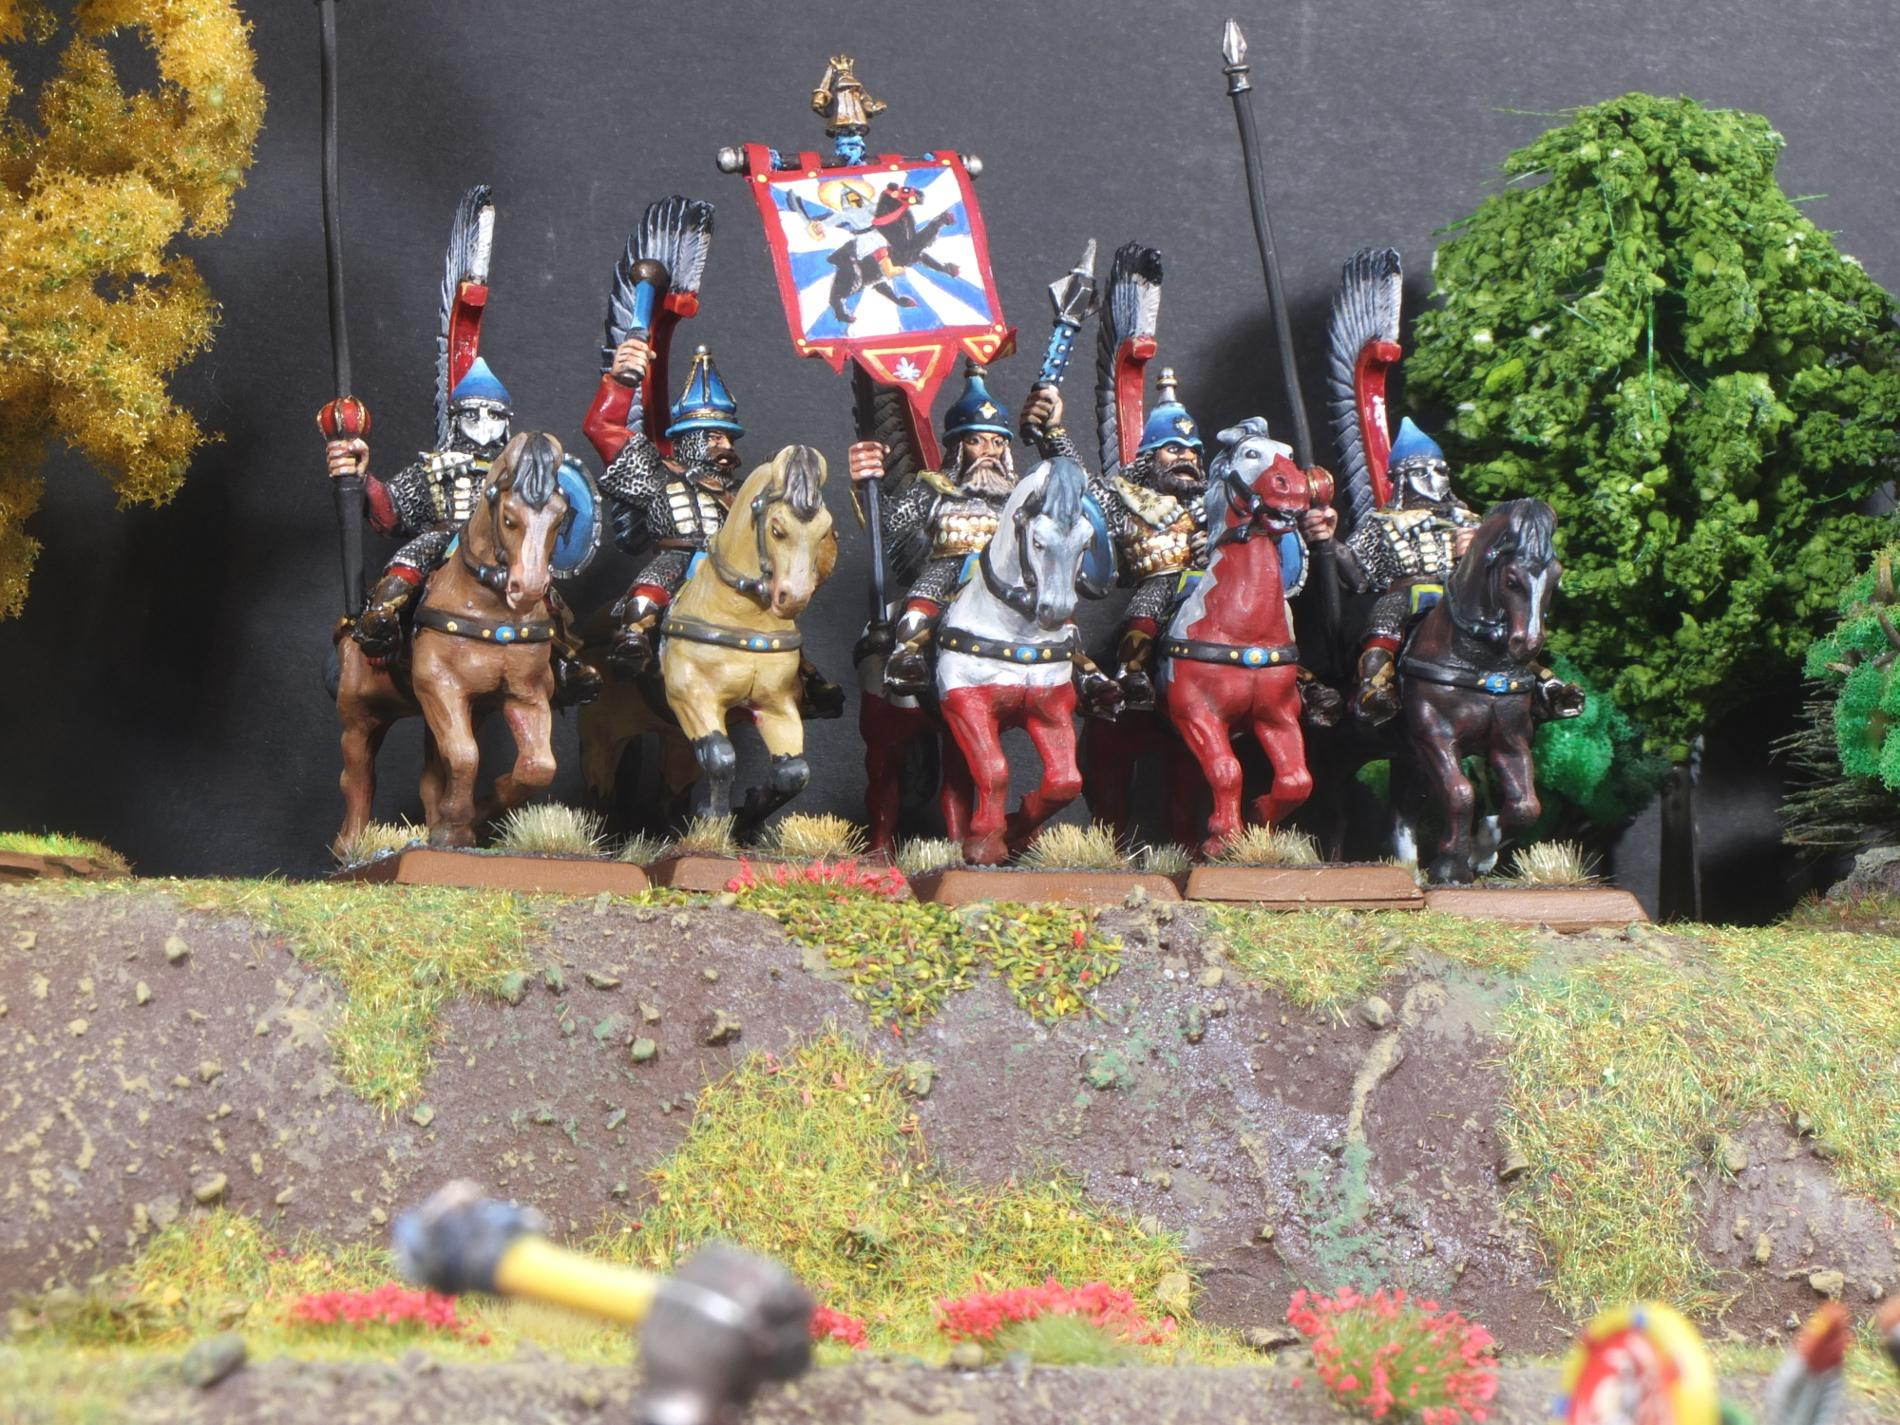 1125414492_when-the-winged-hussars-arrived(3).JPG.f8682b8f389bf09876d2ef15b8b7e6c8.JPG